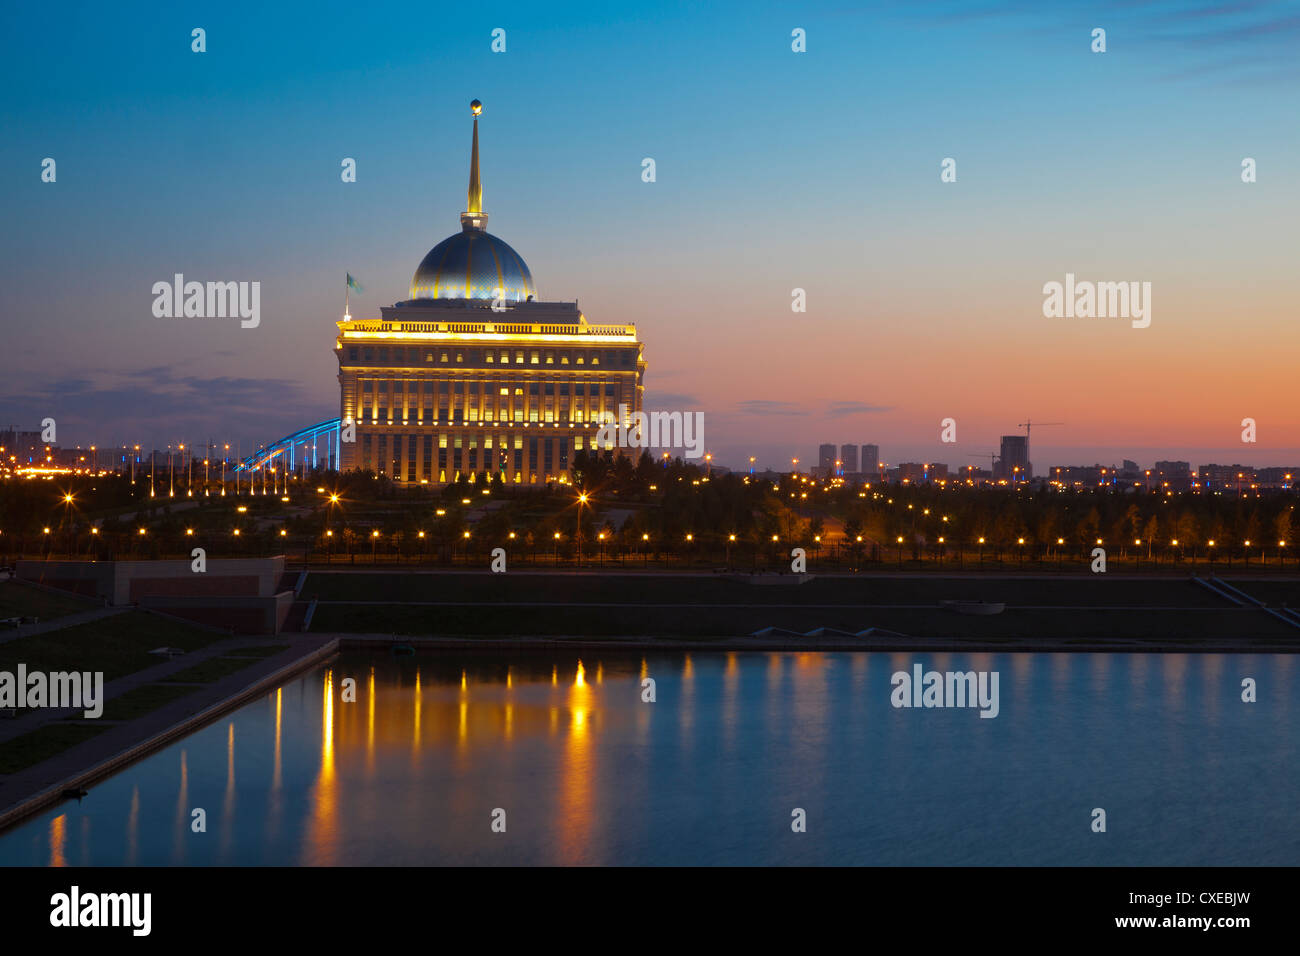 The Ak Orda, Presidential Palace of President Nursultan Nazarbayev at dawn, Astana, Kazakhstan, Central Asia, Asia - Stock Image